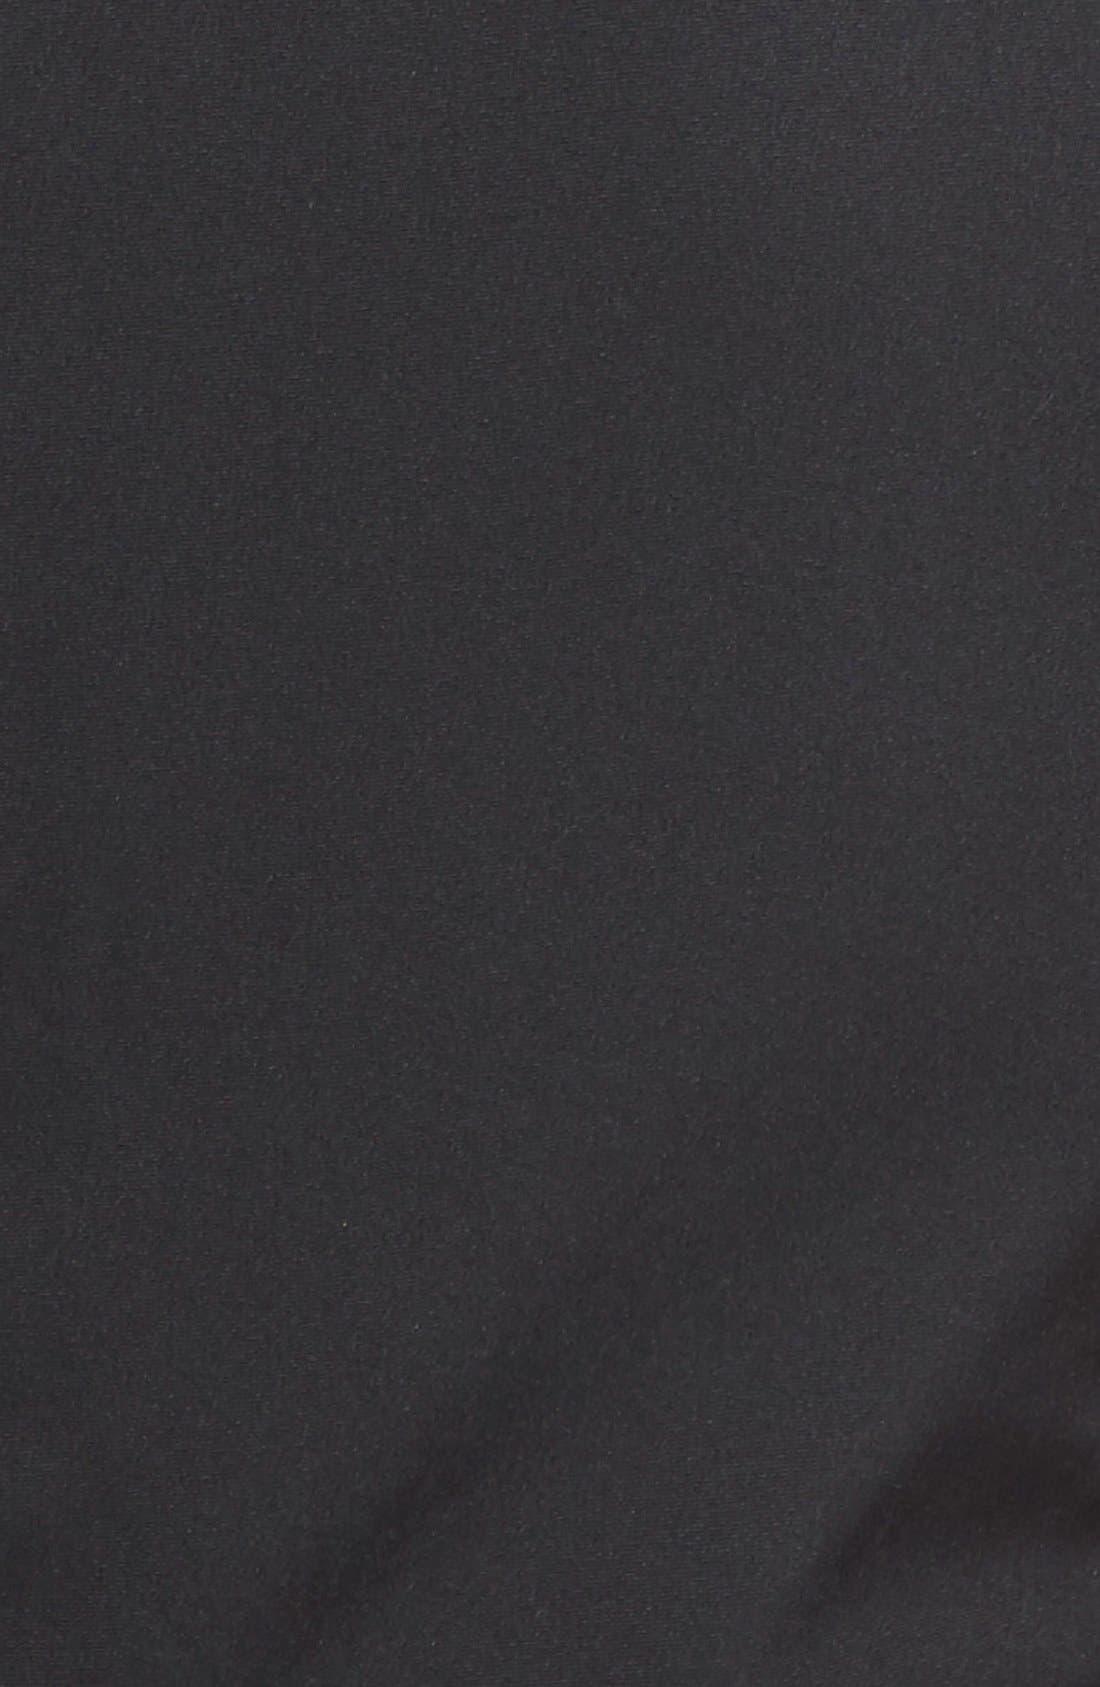 Alternate Image 3  - MARC JACOBS Pleated Sleeveless Fit & Flare Dress